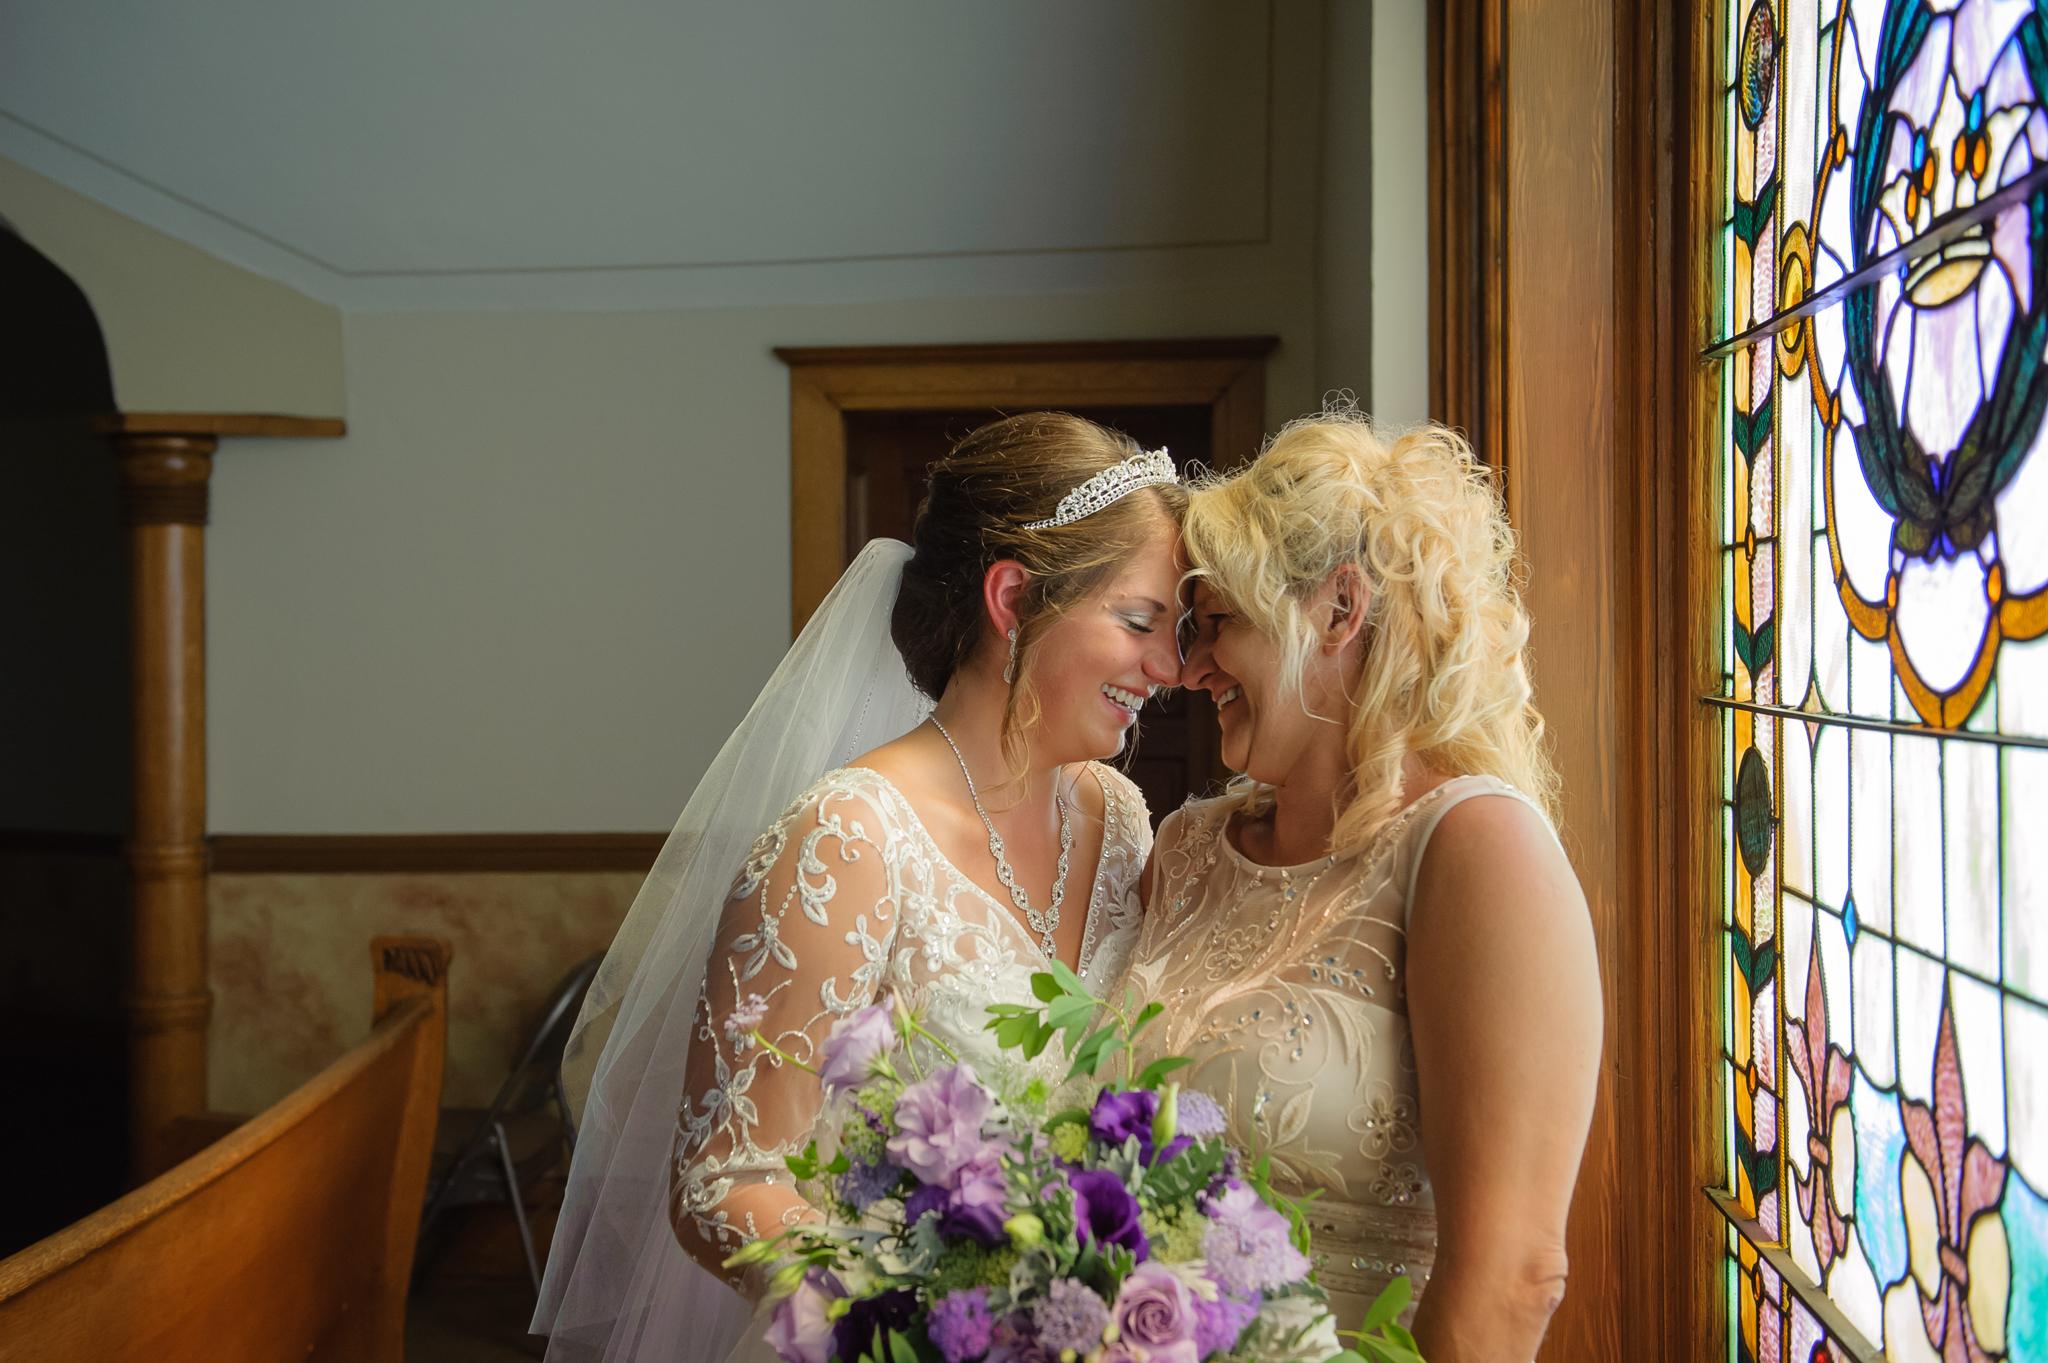 4-ashland washburn wedding photography700_4859.jpg